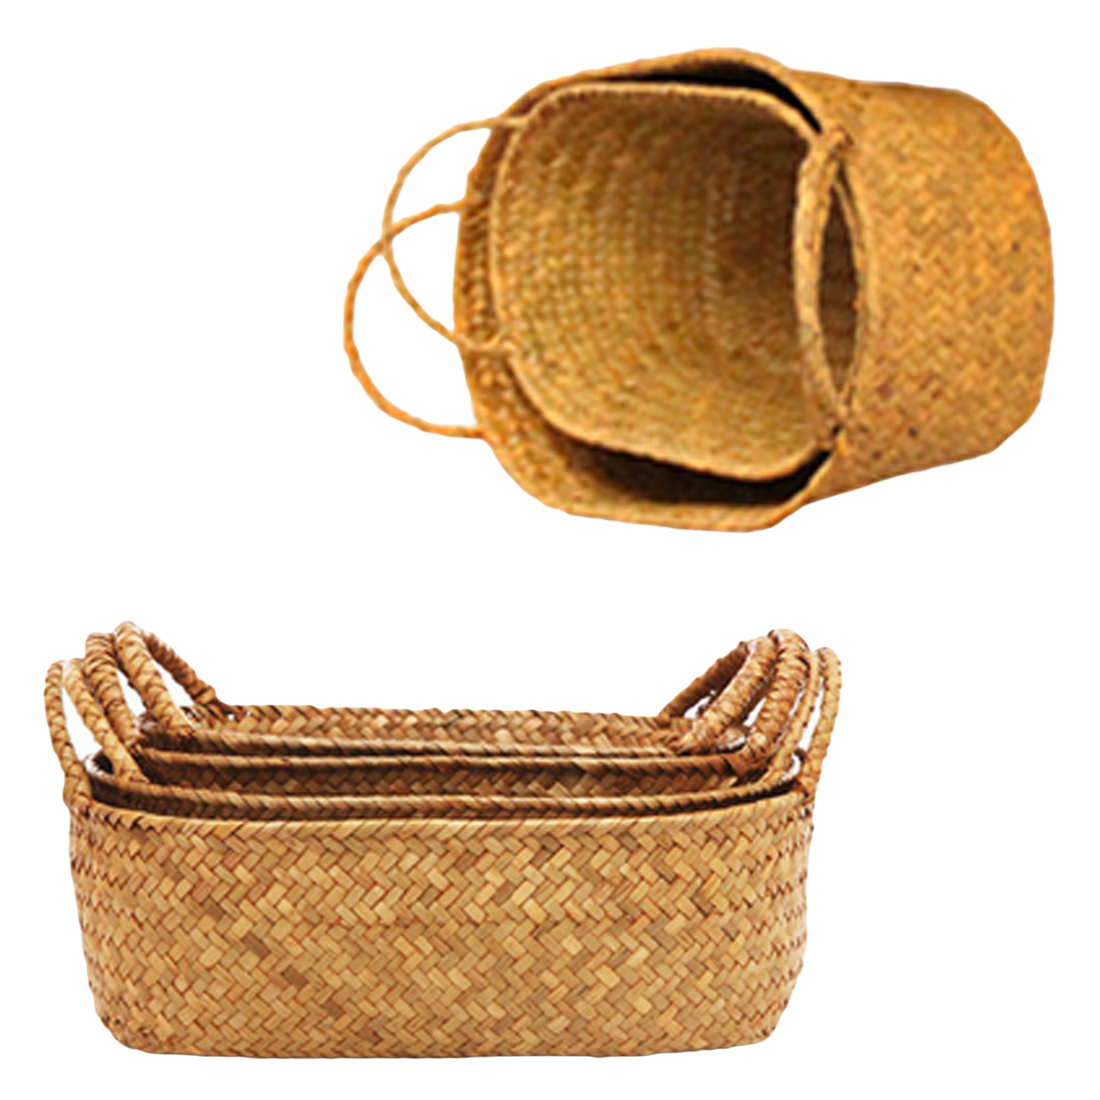 1pc Seagrass Wickerwork Basket Rattan Foldable Hanging Flower Pot Planter Woven Dirty Laundry Hamper Storage Basket Holder Case